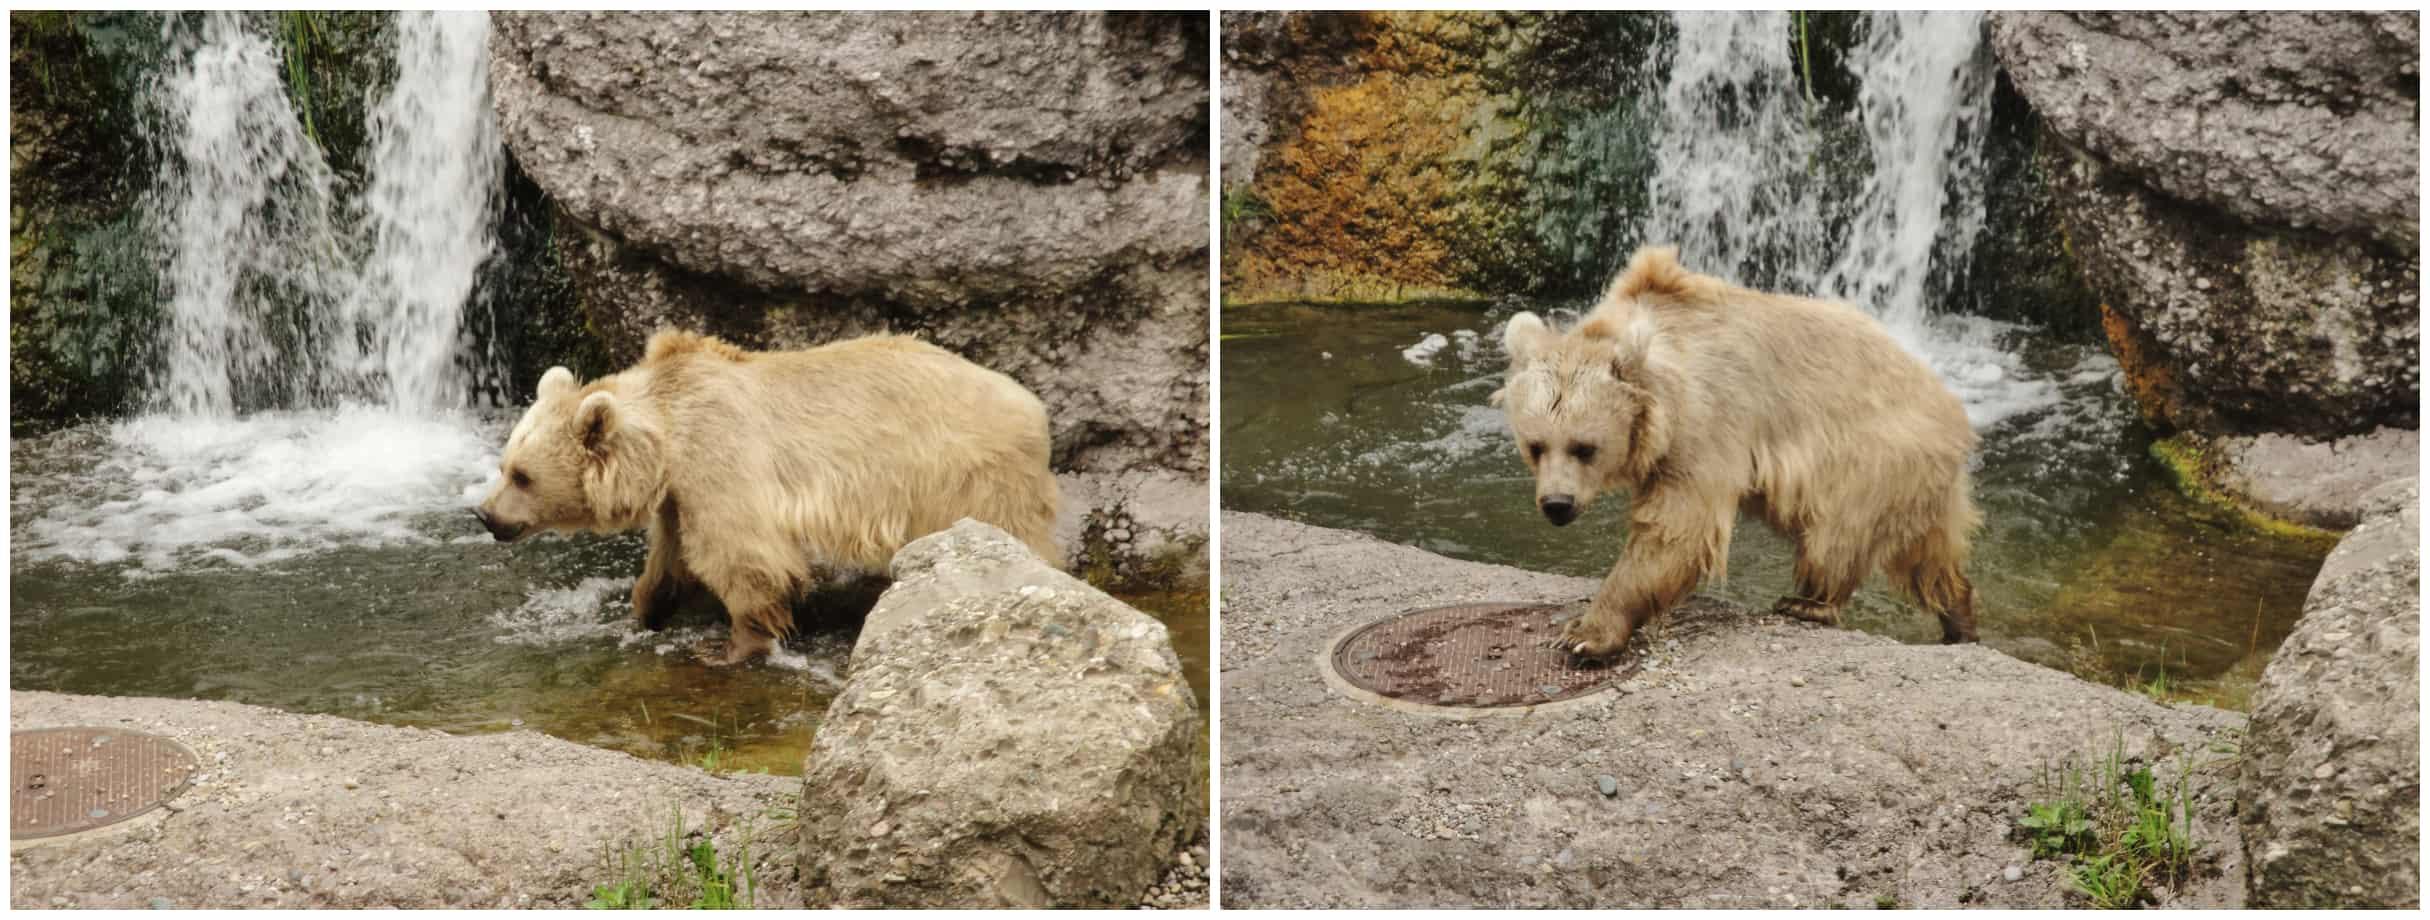 Orso siriano al parco Goldau